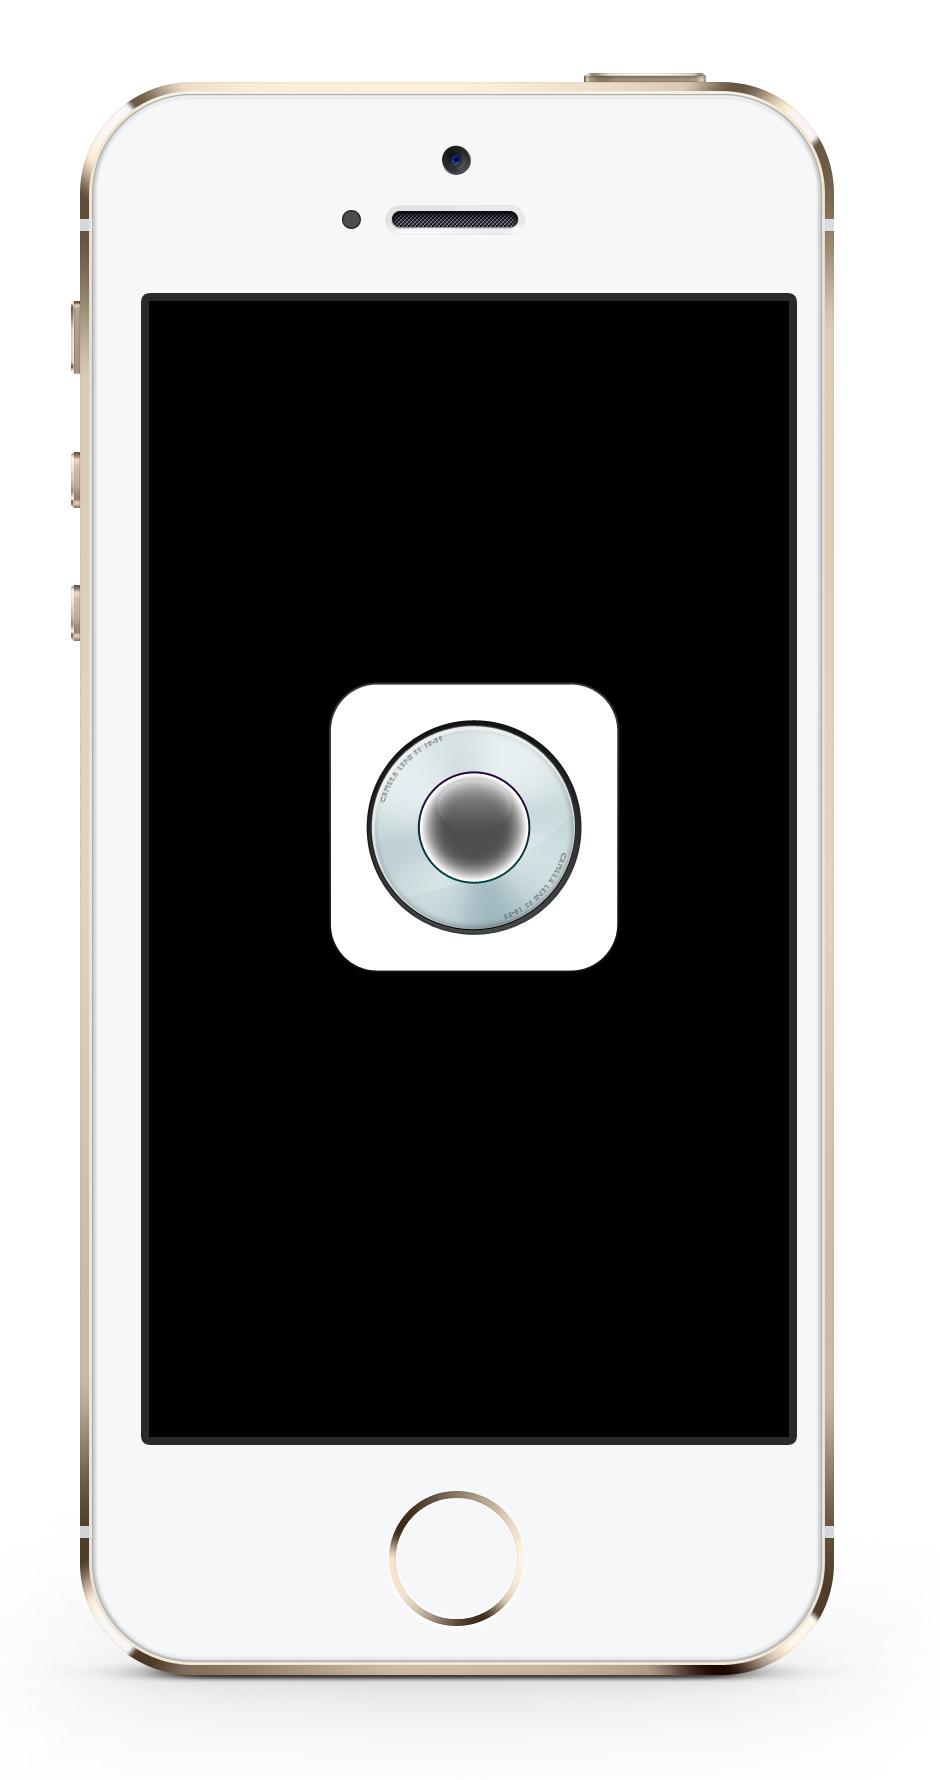 Iphone 5s Reparatur Berlin